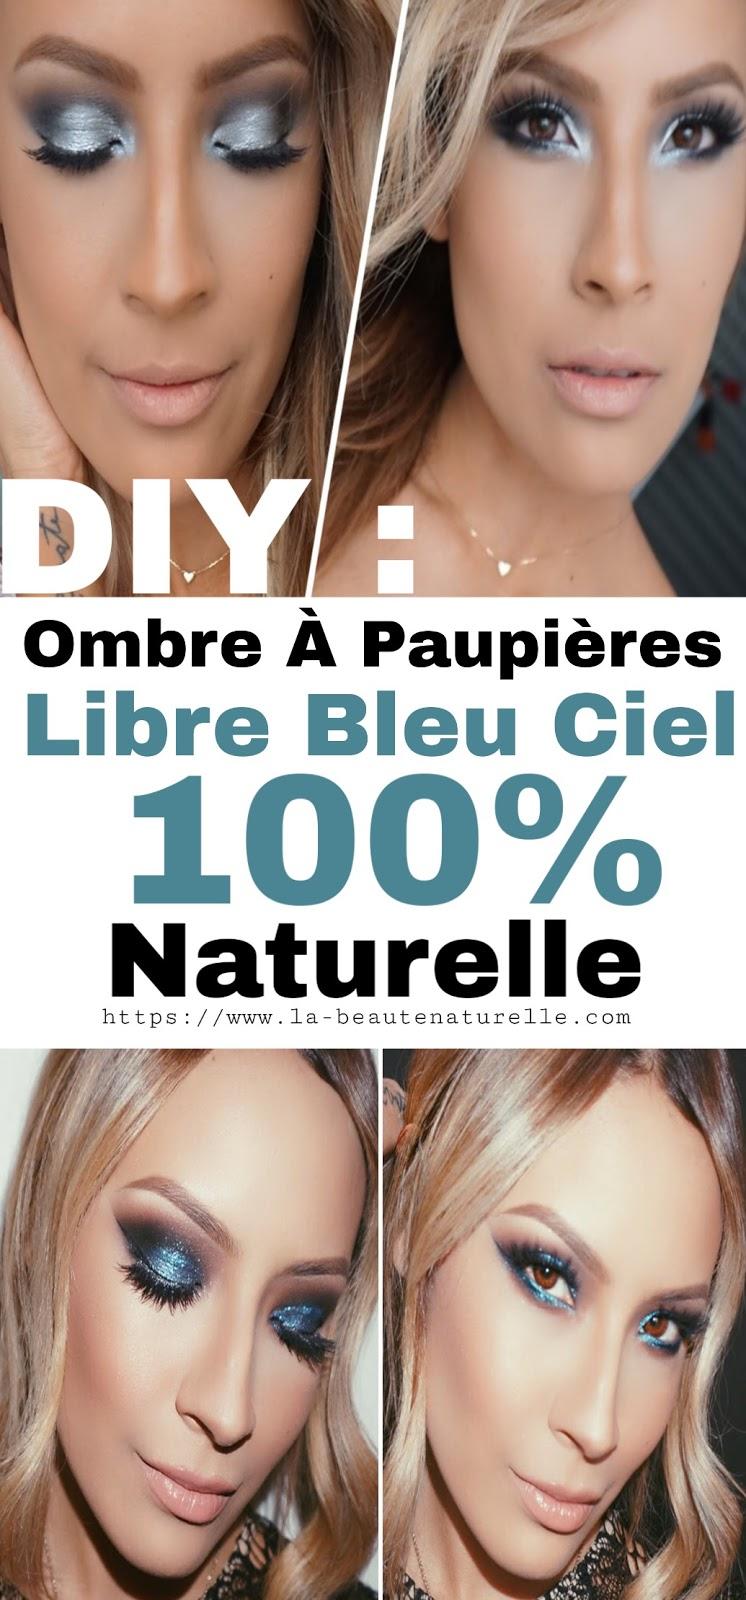 DIY : Ombre À Paupières Libre Bleu Ciel 100% Naturelle